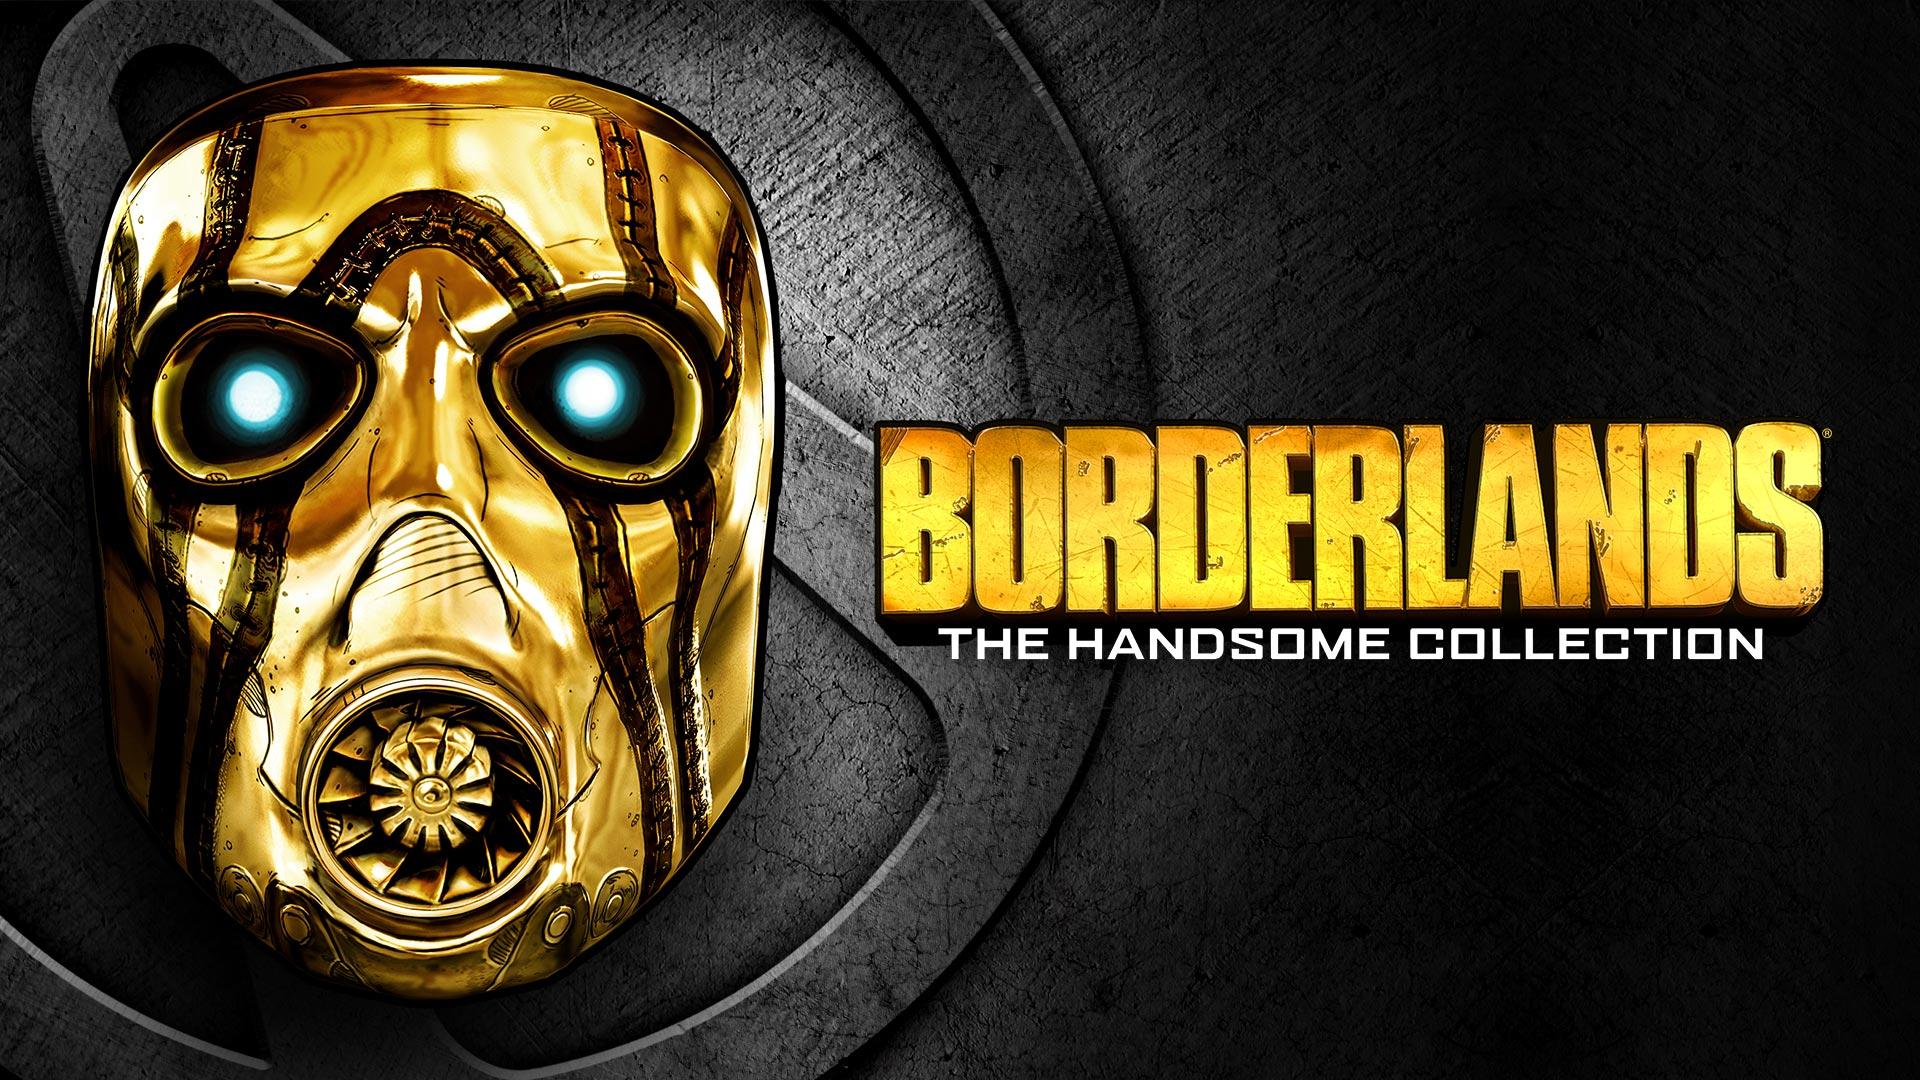 Nintendo Eshop: Borderlands: The Handsome Collection (Nintendo Switch)